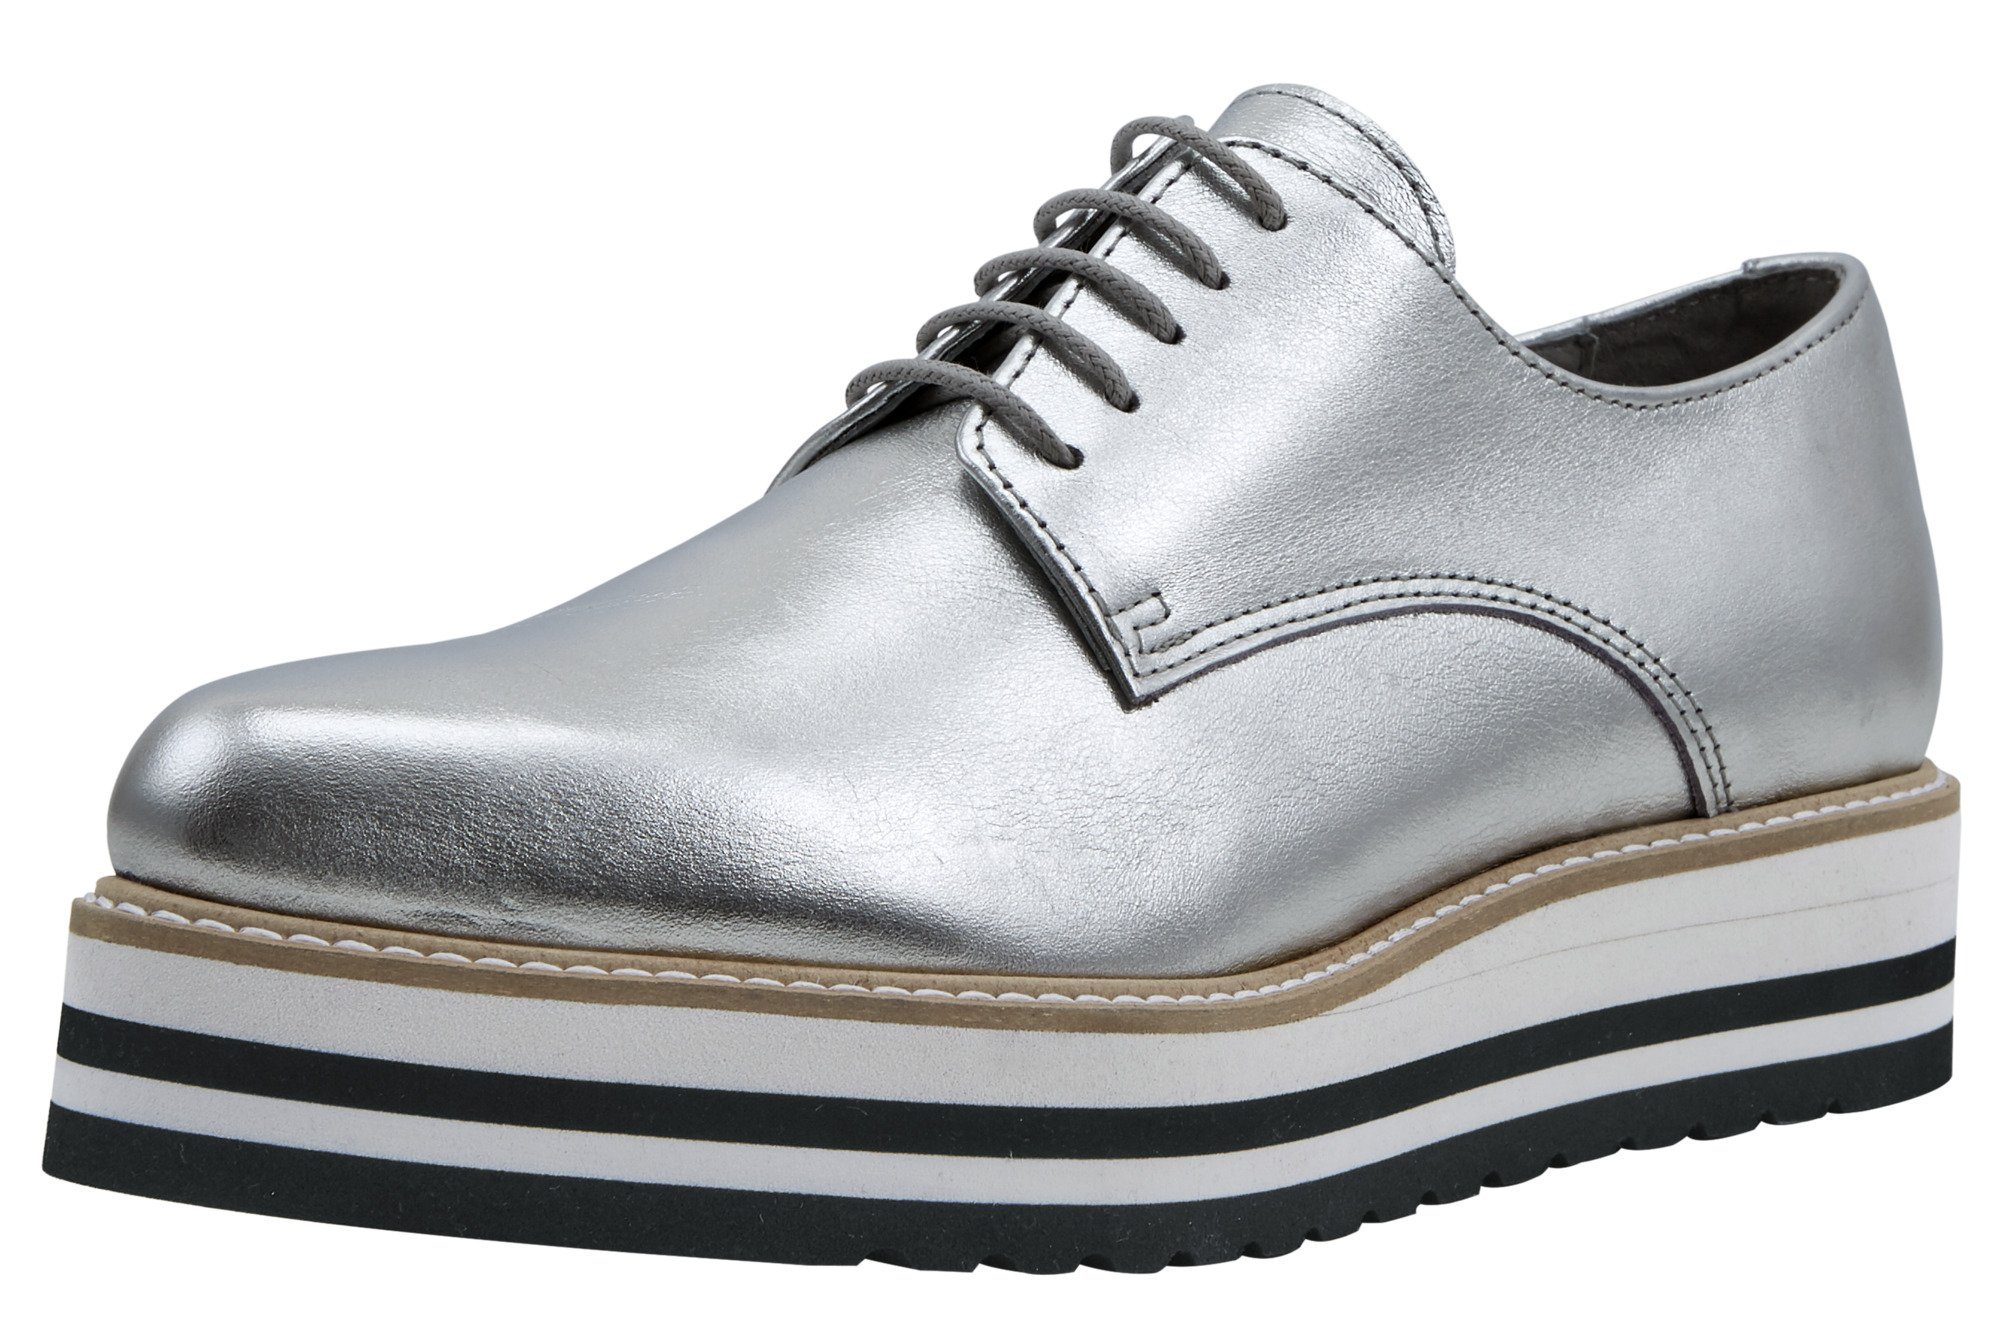 Spezialangebot Geox Sneakers Schuhe Damian schwarz NEU